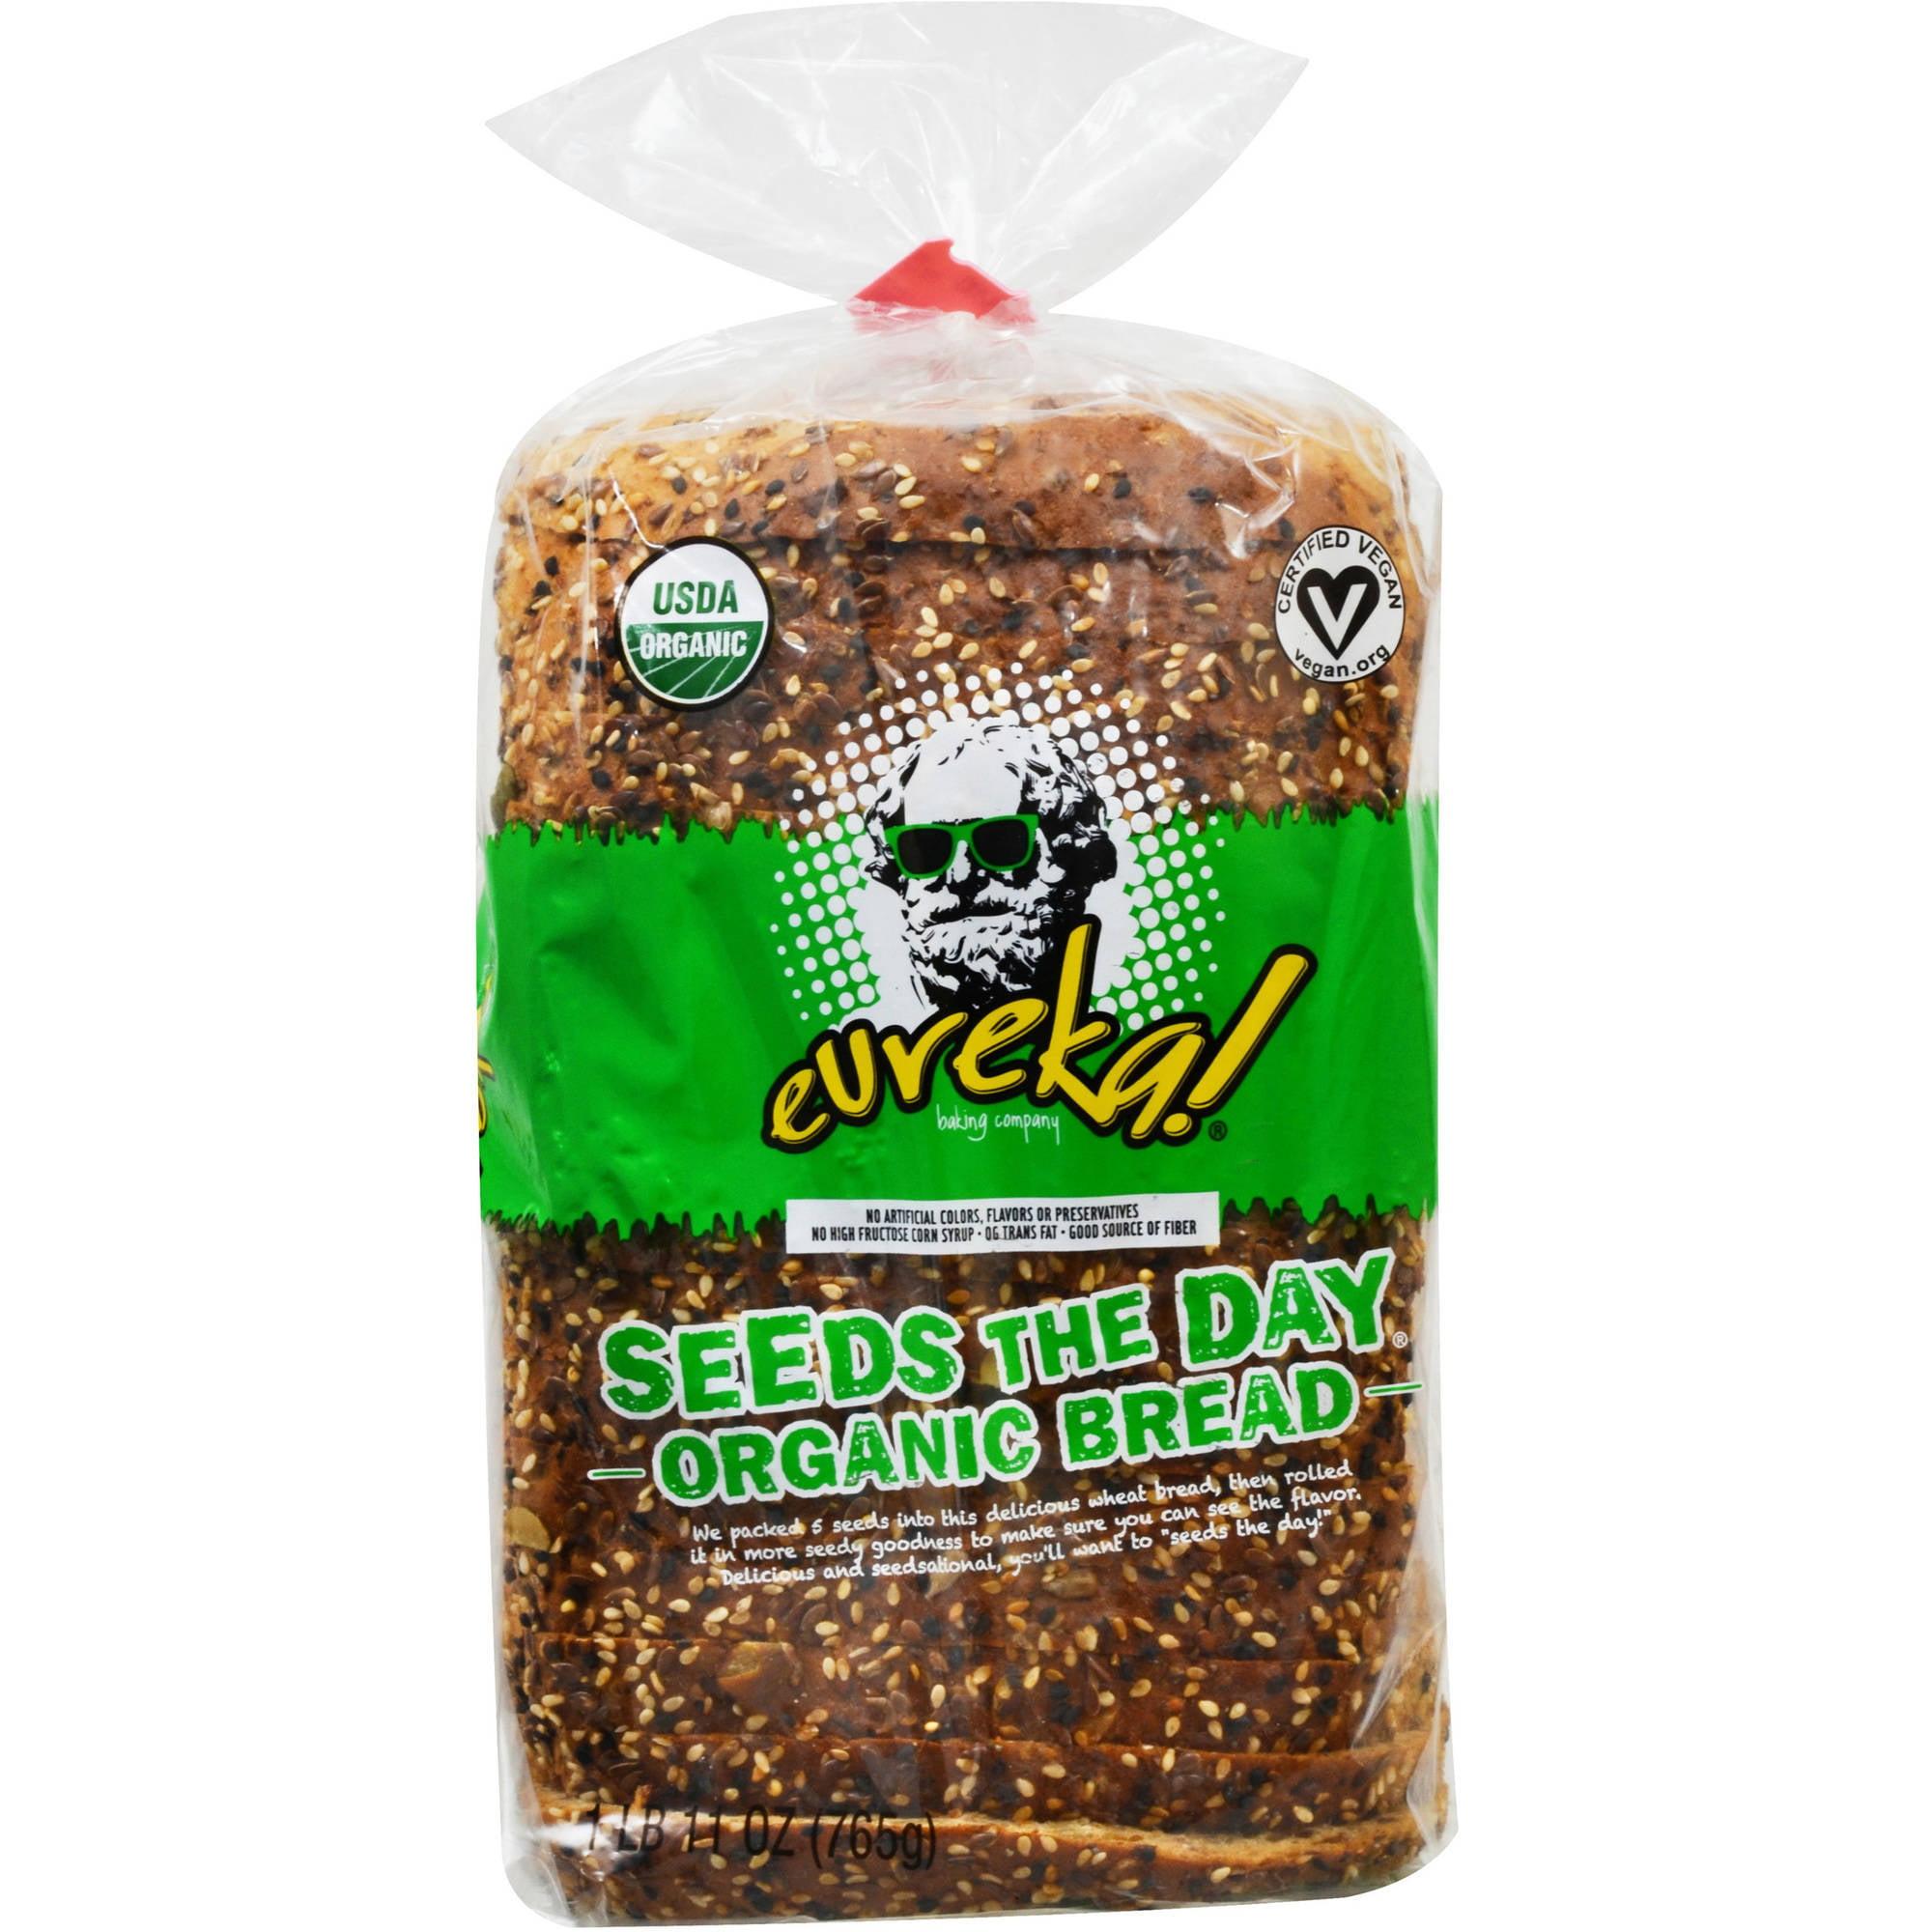 Eureka! Seeds the Day Organic Bread, 1.69 lbs